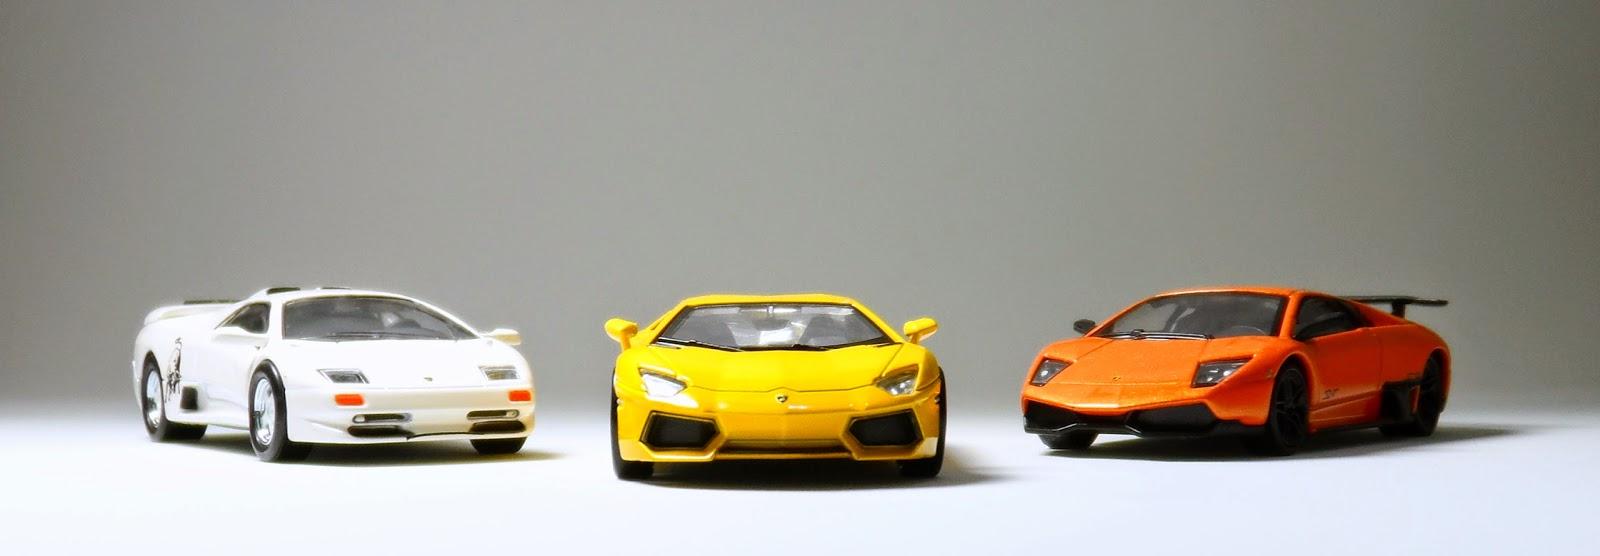 Especial Lamborghini - A era atual - Parte I.